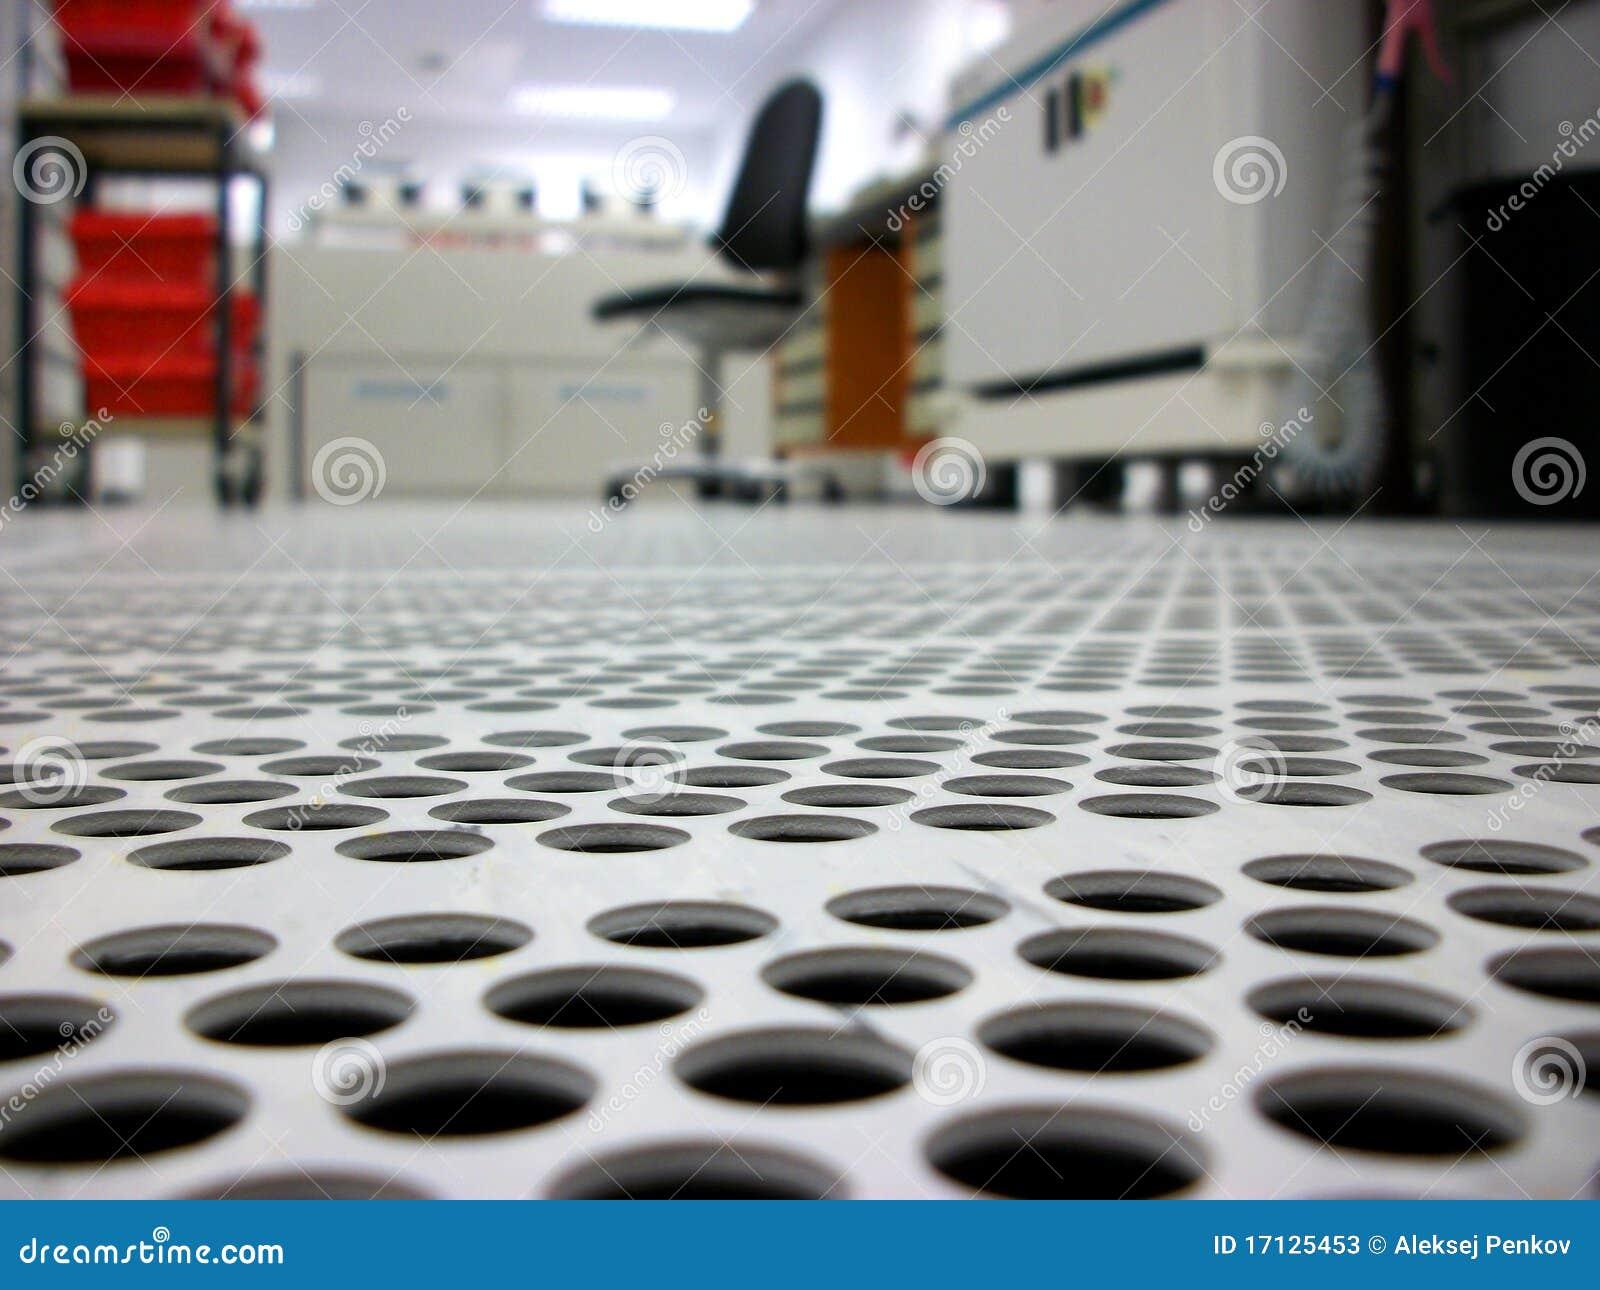 Clean Room Flooring : Ventilated floor in a clean room stock image